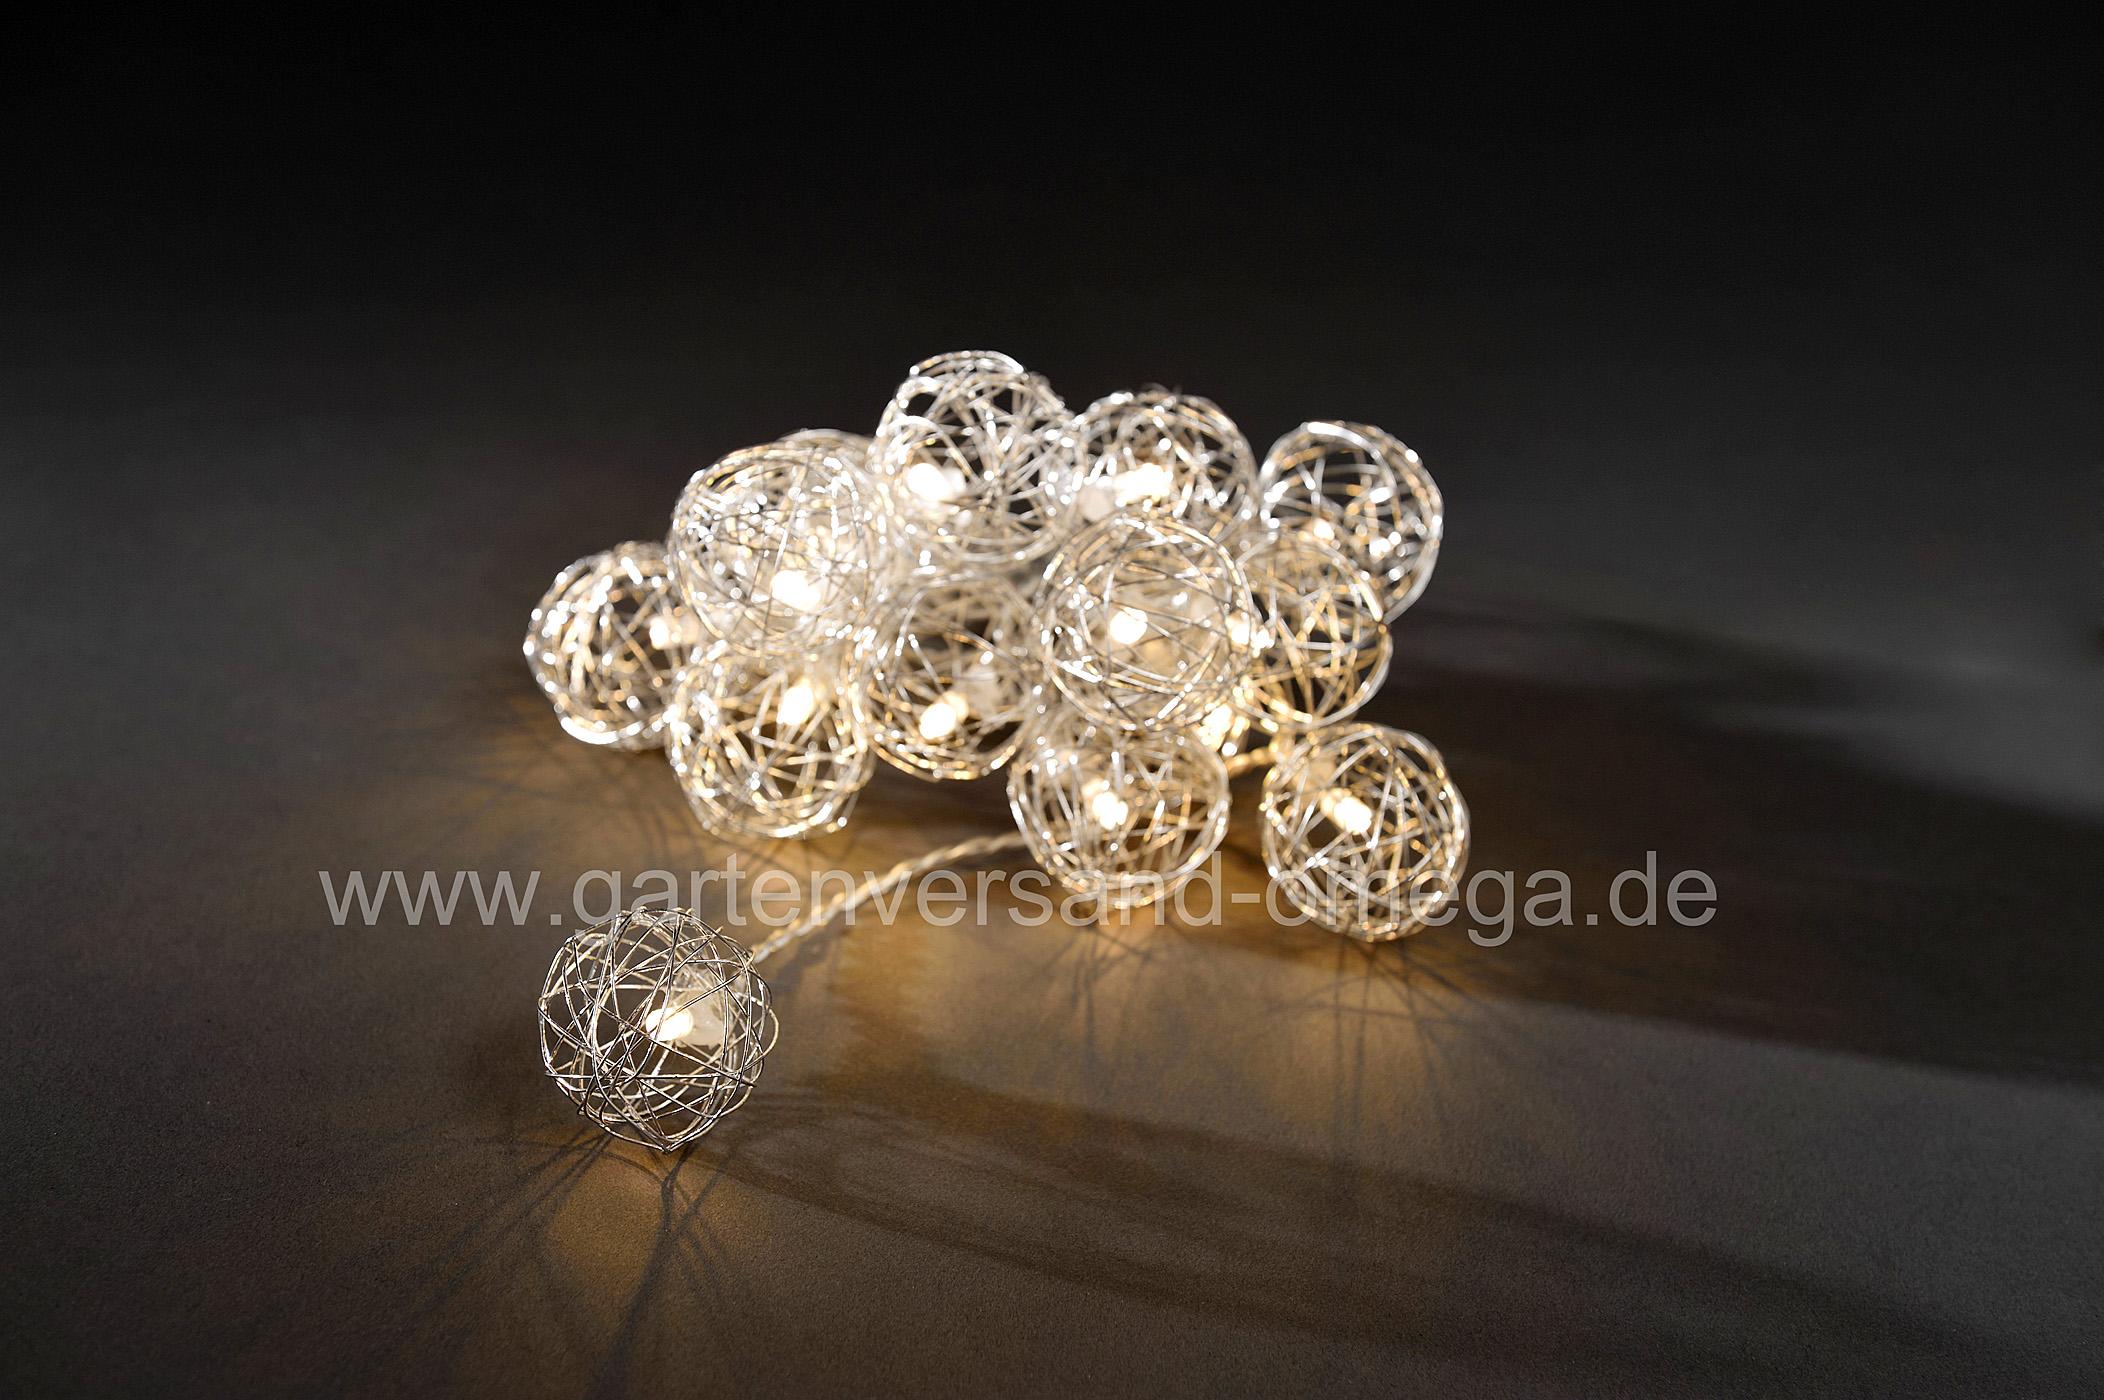 led lichterkette mit aluminium drahtkugeln weihnachtsdeko drahtkugeln weihnachtslichterkette. Black Bedroom Furniture Sets. Home Design Ideas